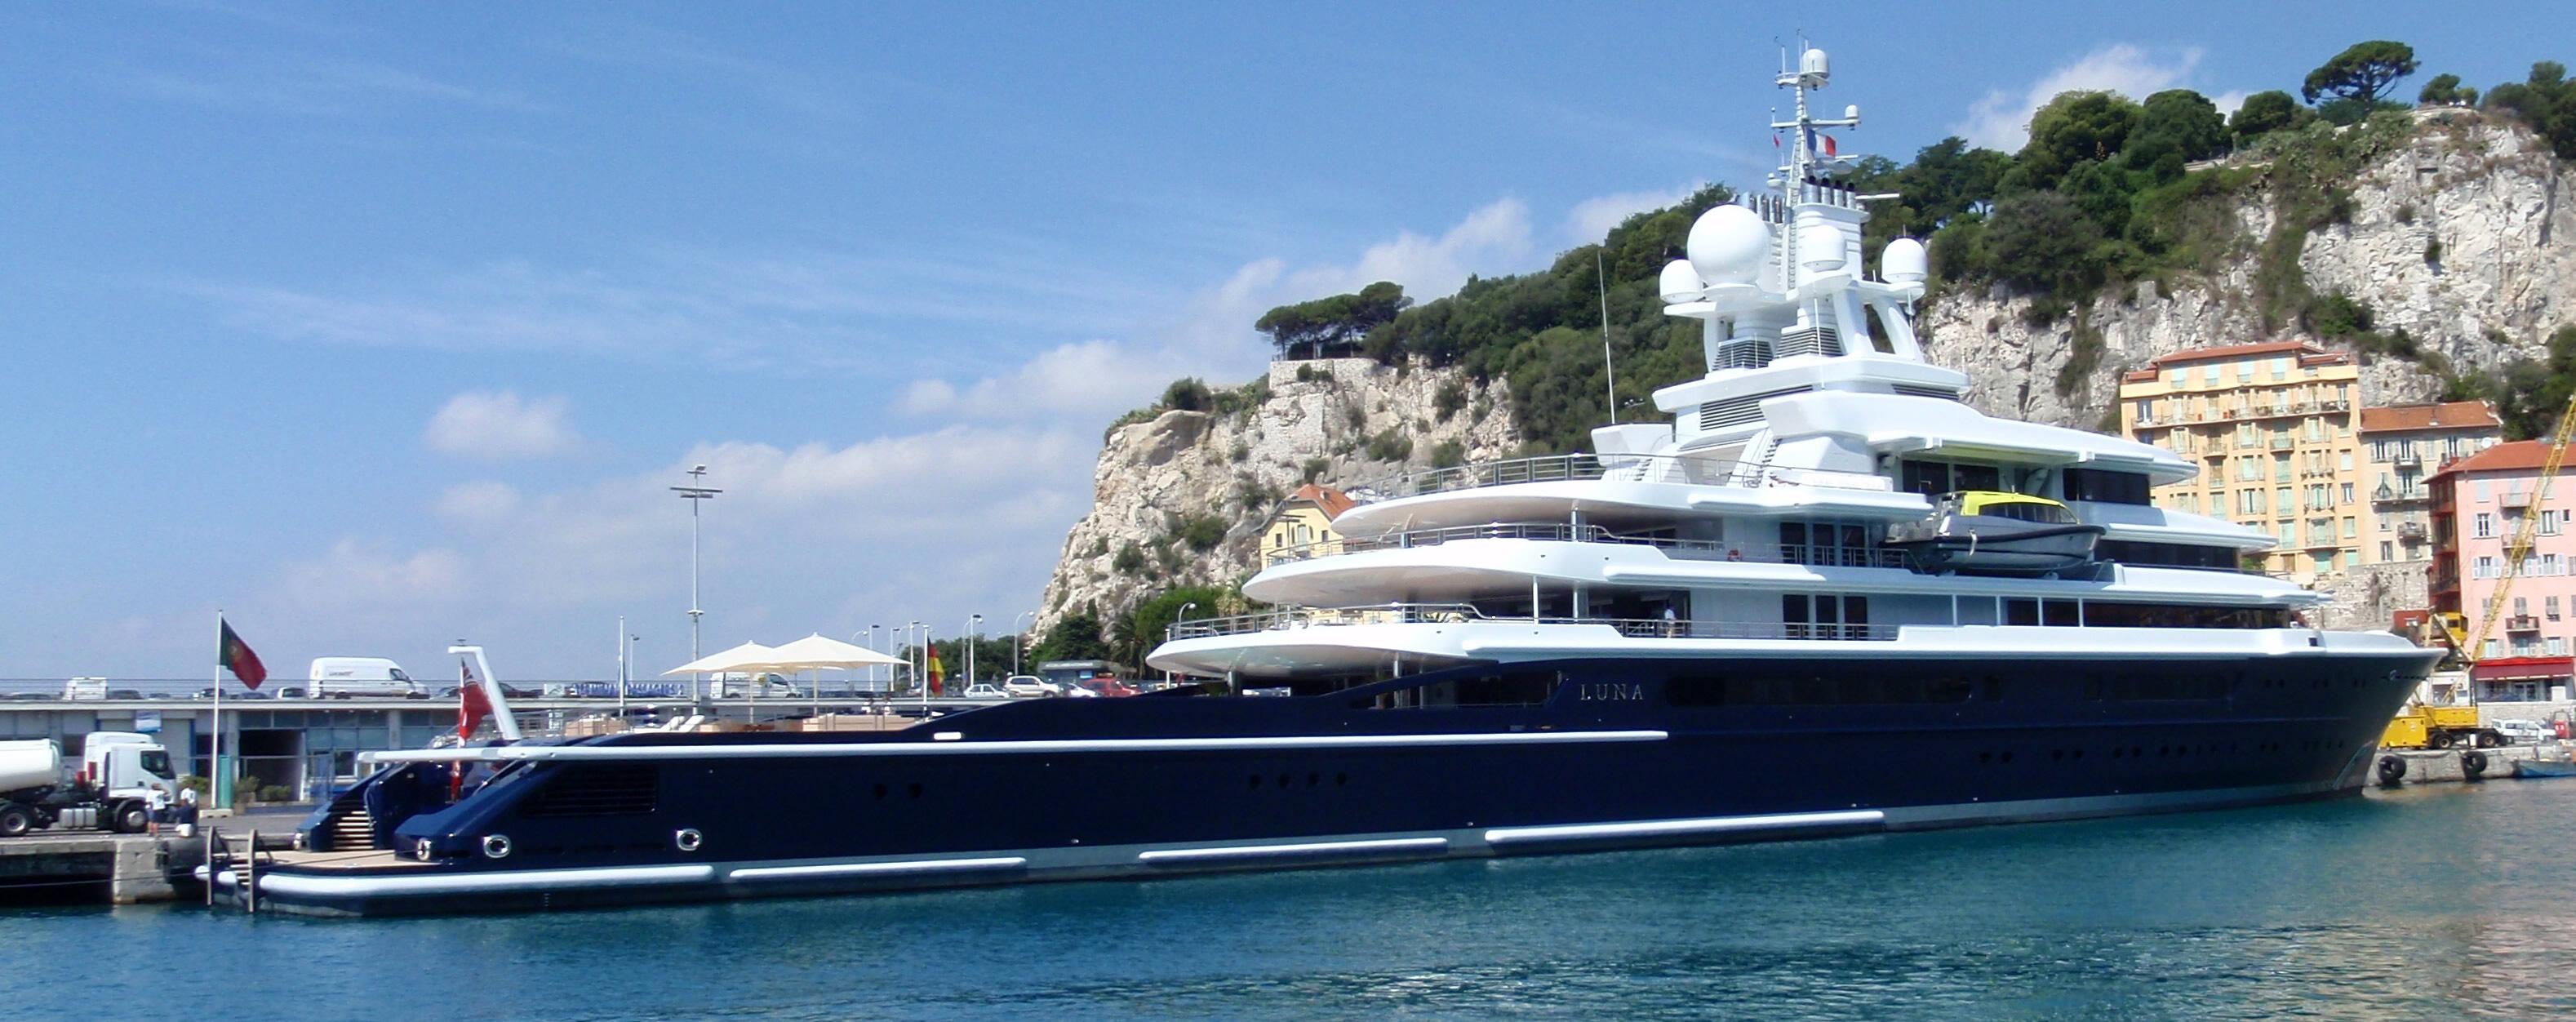 Roman Abramovics Luna yacht Luna